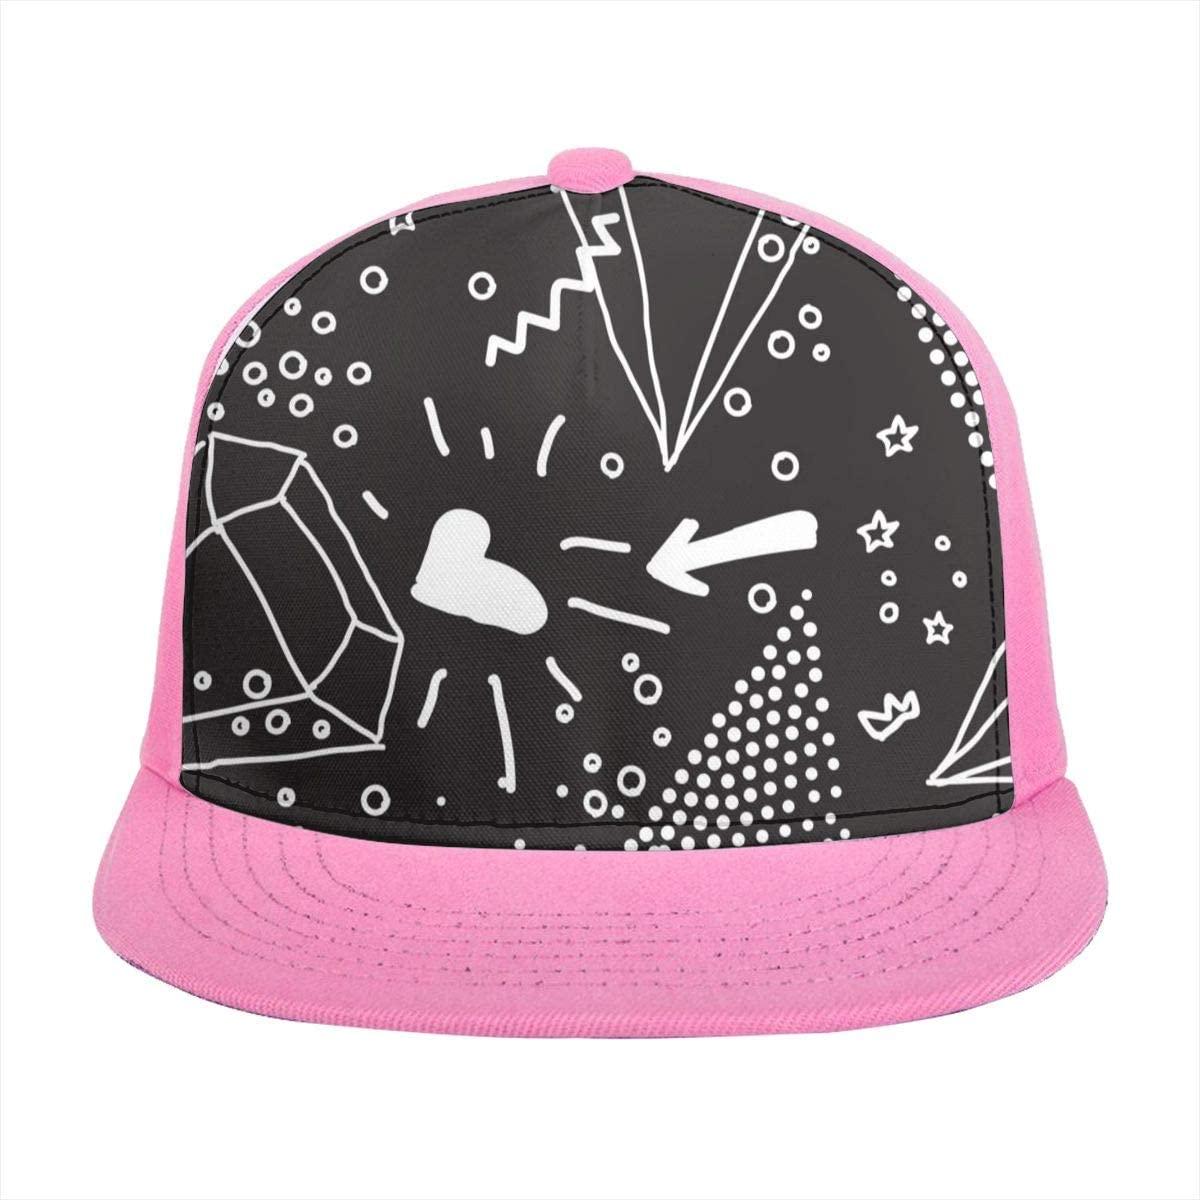 SLHFPX Sun Visor Hat Simple Seamless Doodle Pattern in Kitsch, Baseball Cap Flat Brim Hat for Women Men Summer